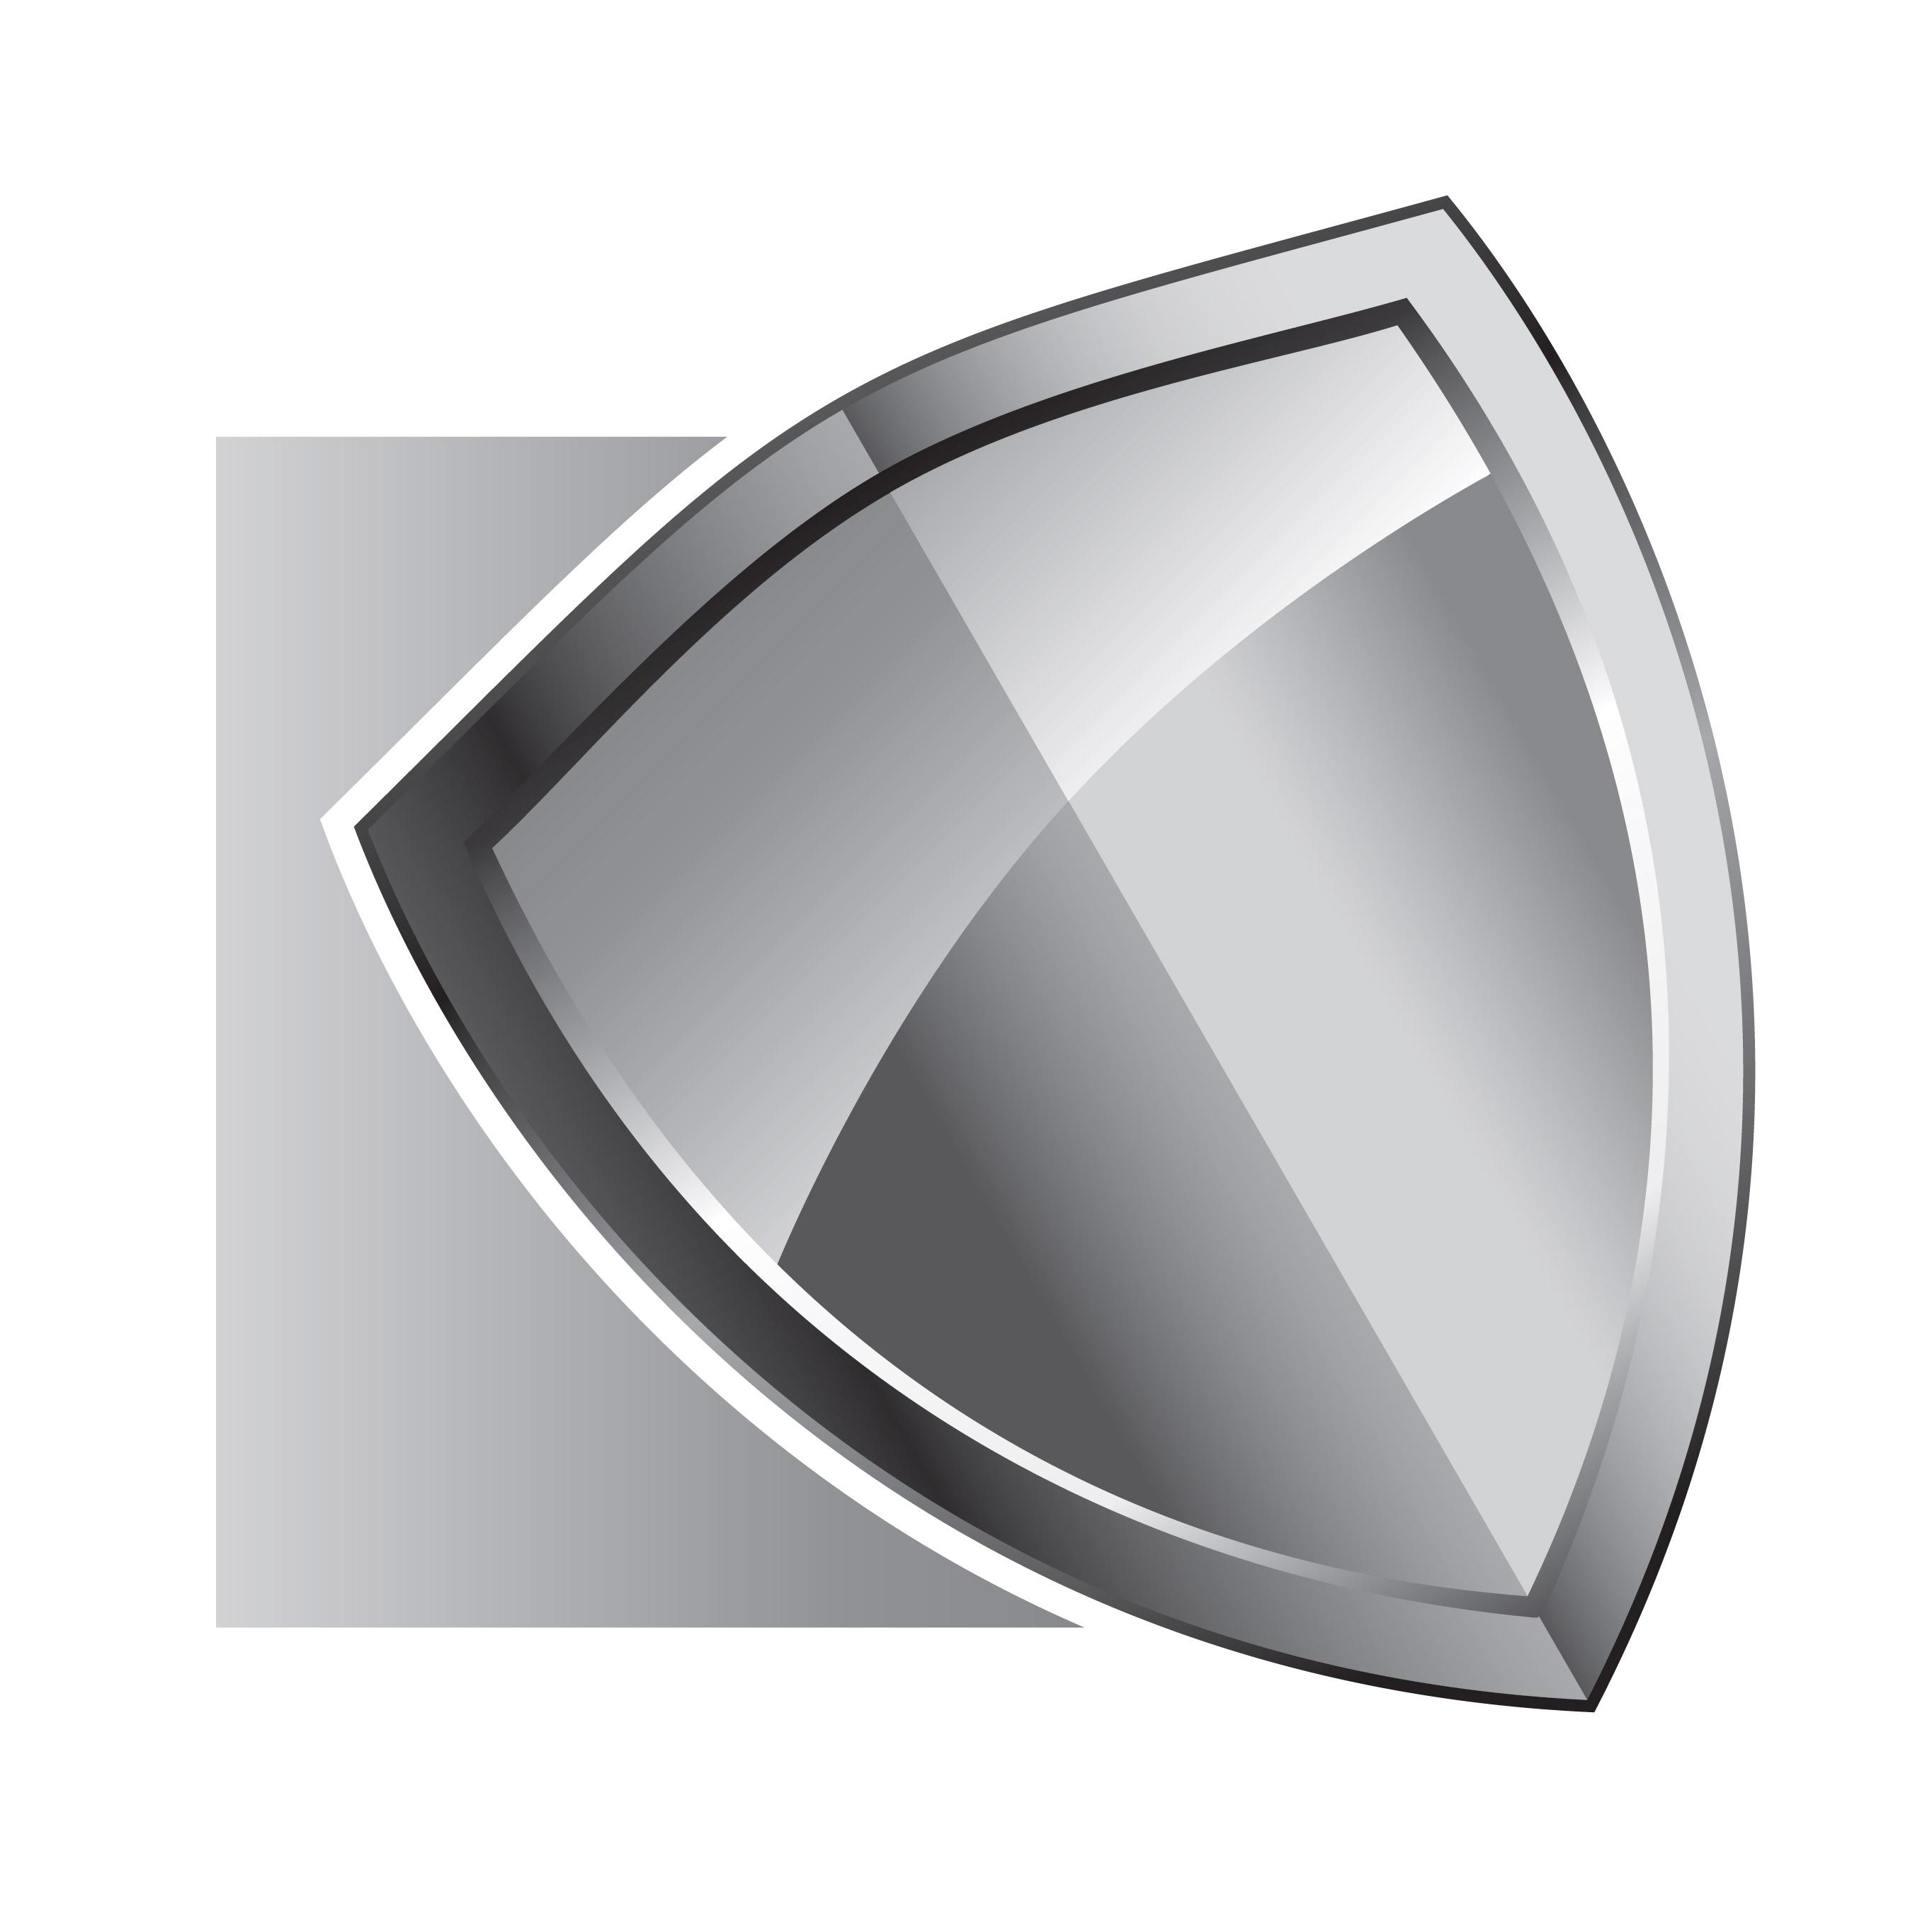 Lavasciuga VERSIONE CHROME®  in acciaio INOX